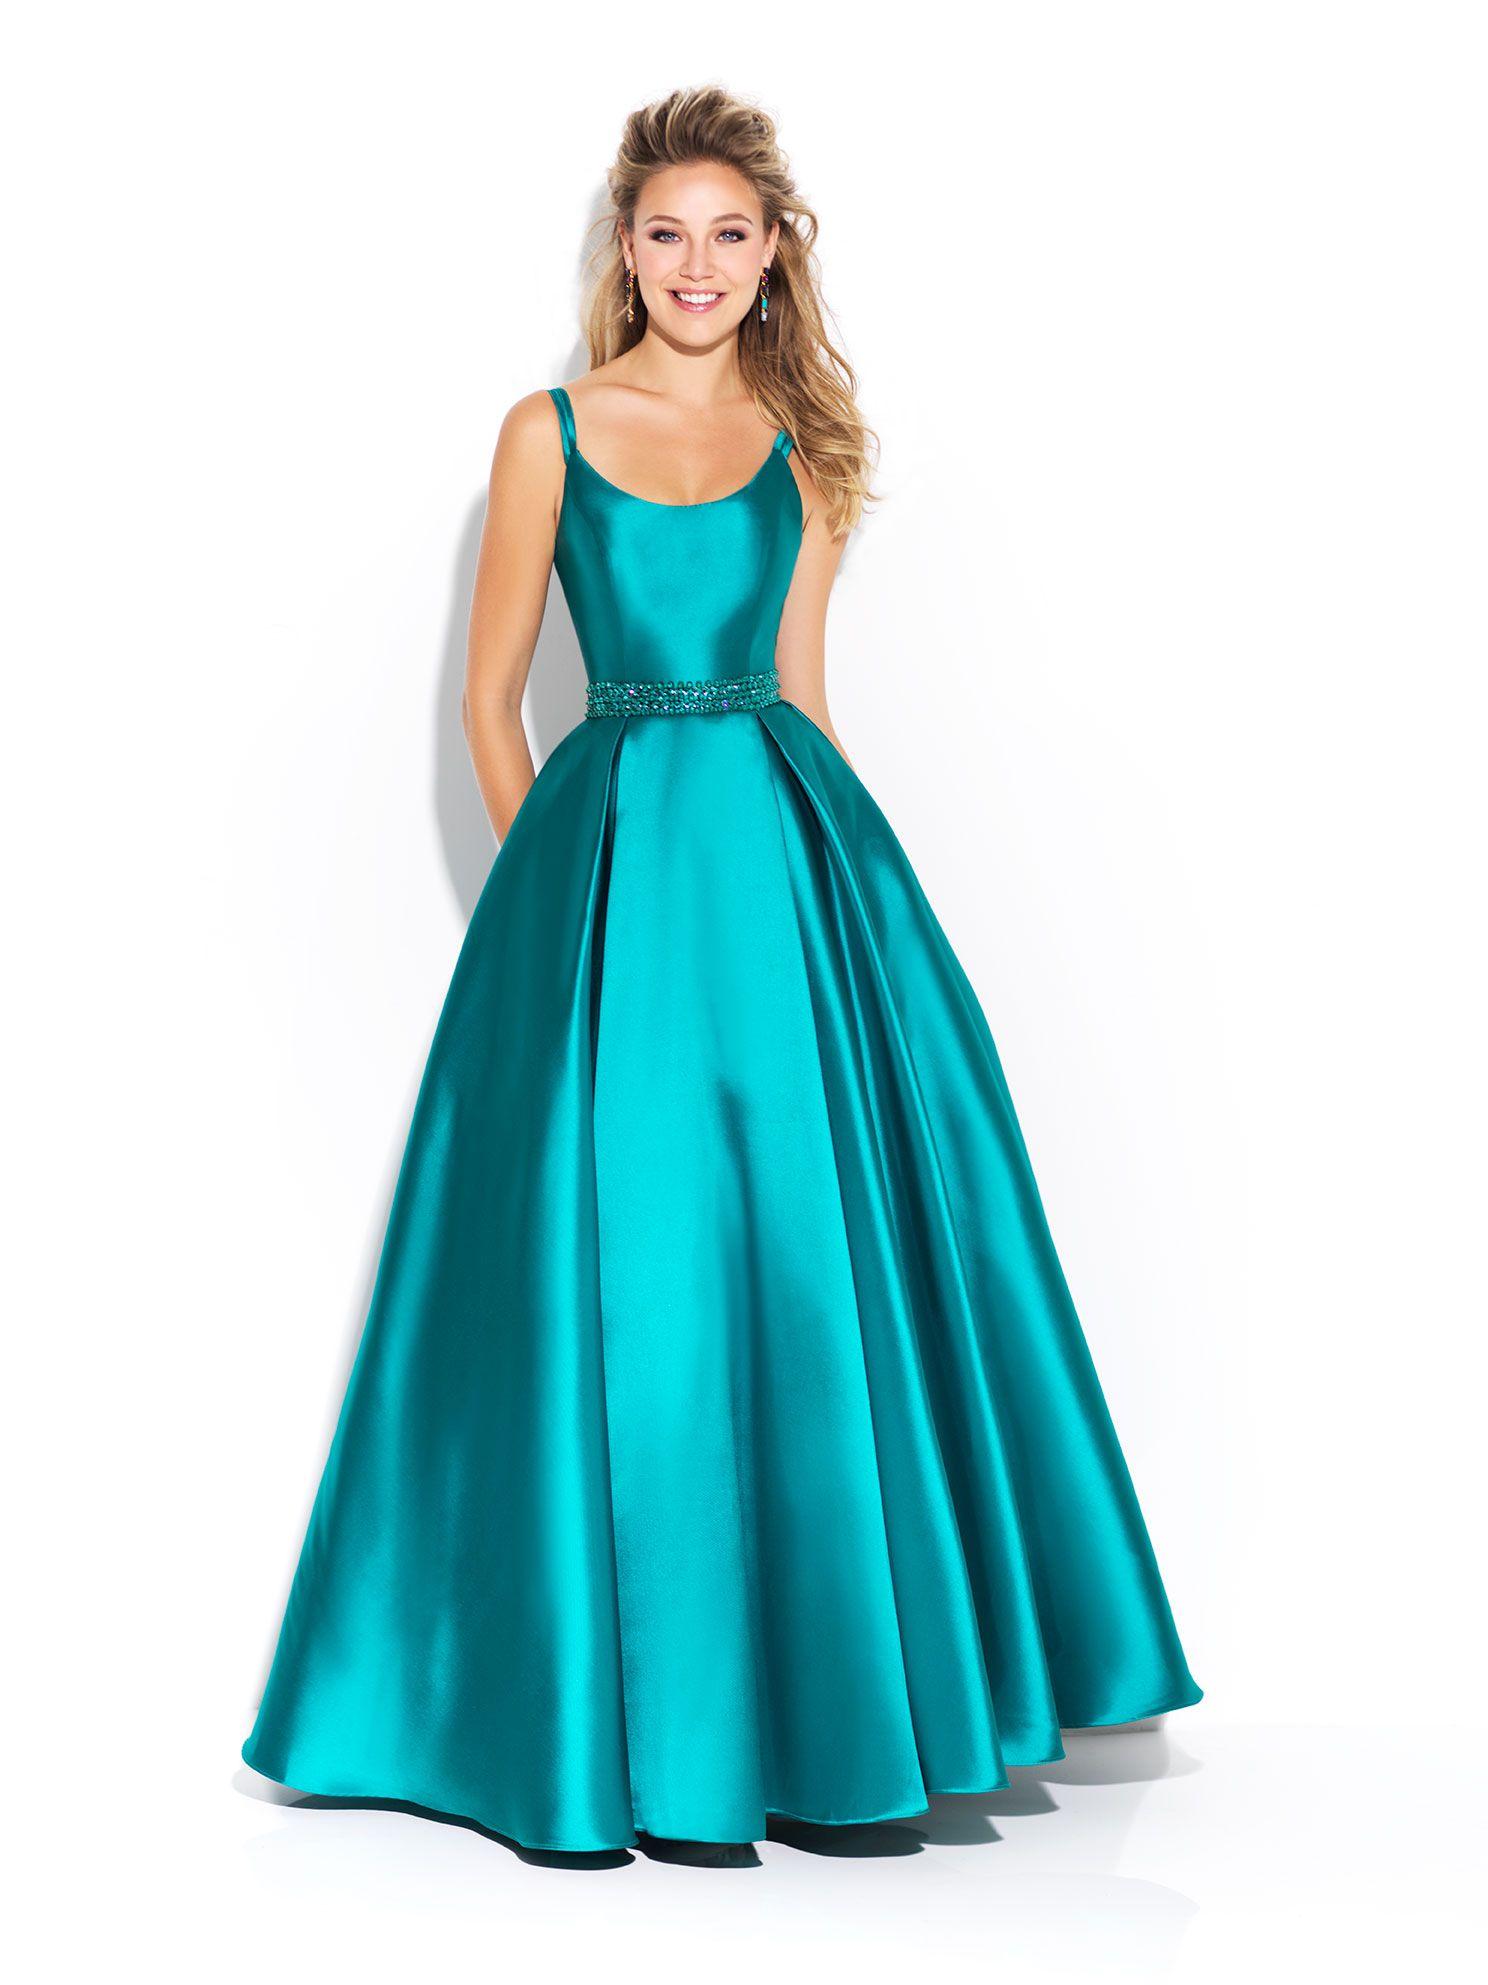 Madison james madison james prom dresses pinterest prom